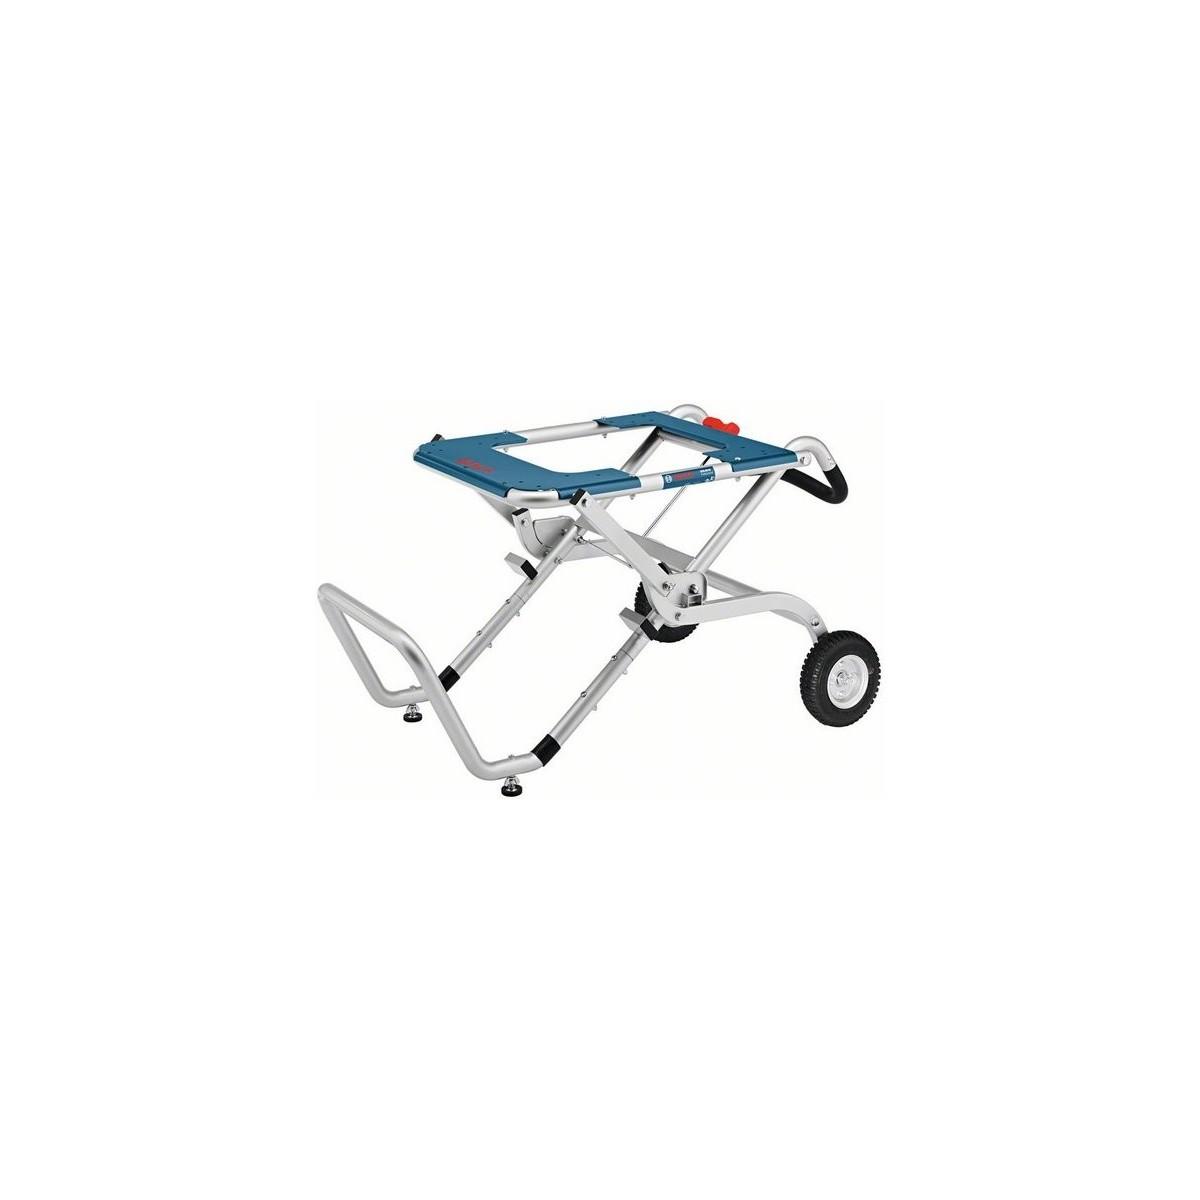 BOSCH Transportēšanas un darba galds GTA 60 W Professional 0601B12000